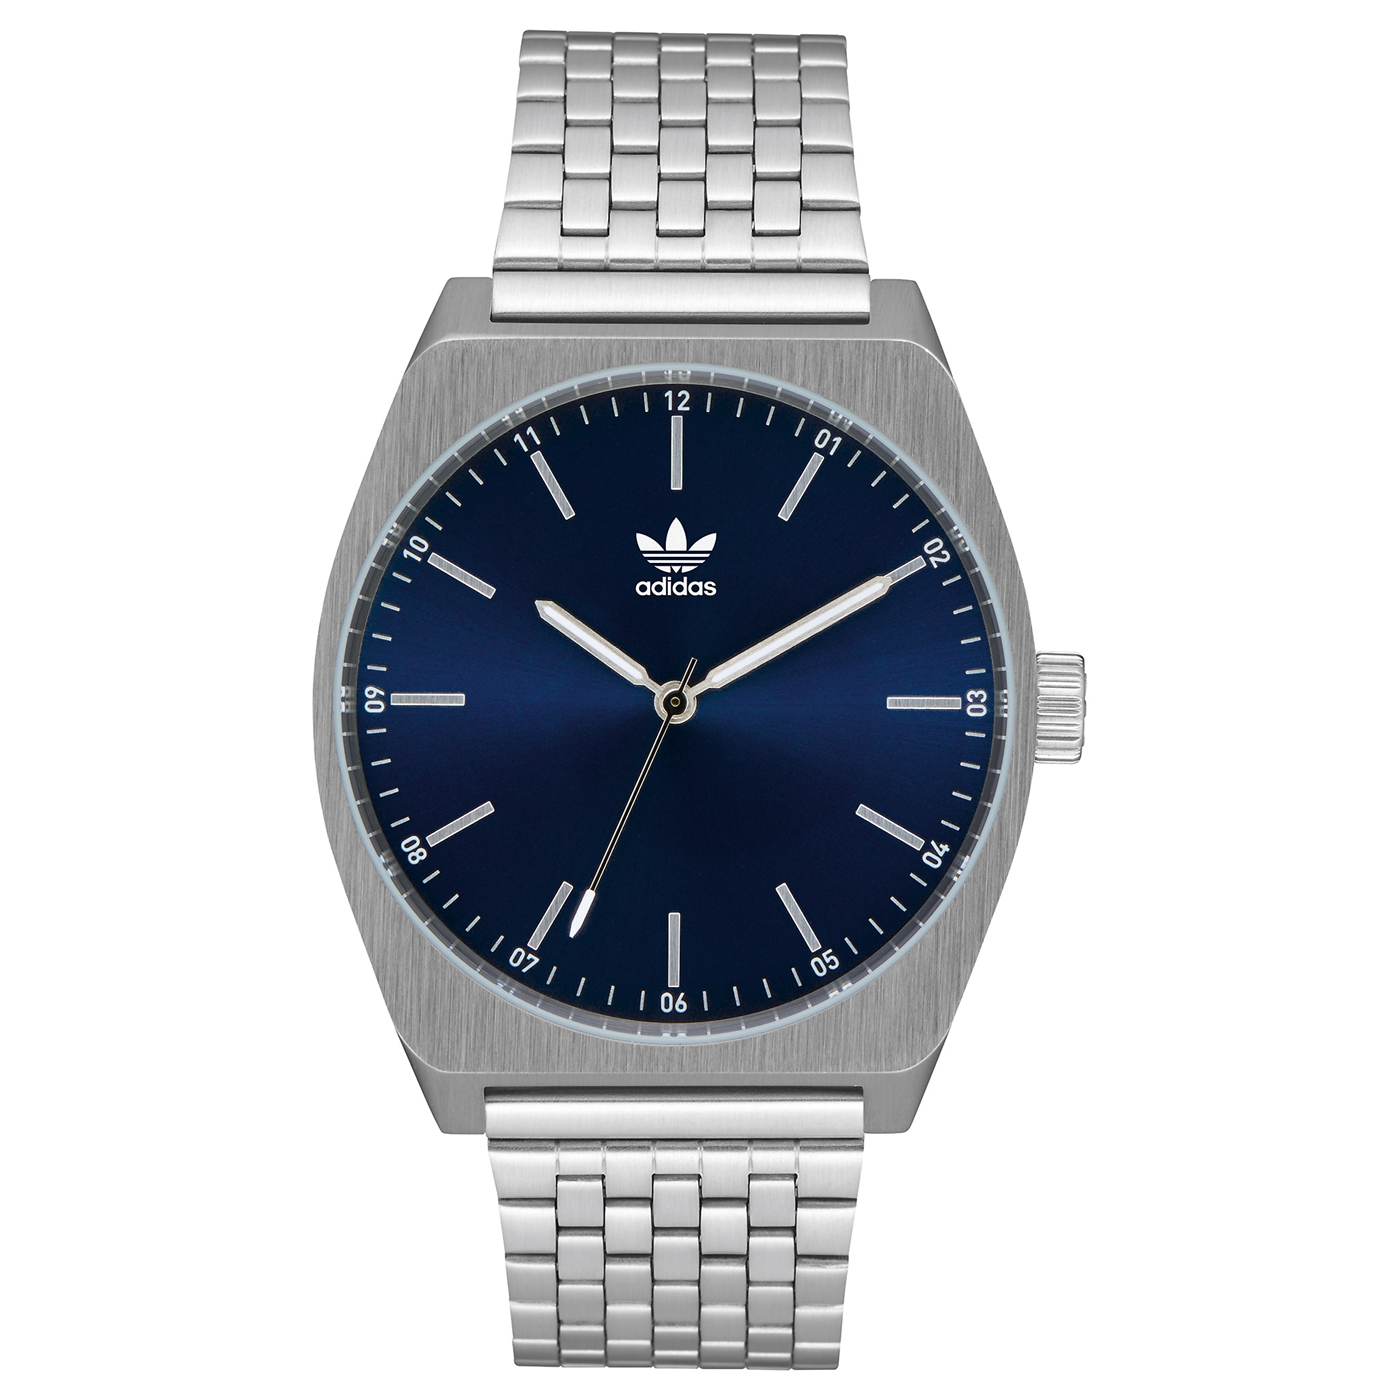 Bilde av Adidas Process watch Z02 2928 00